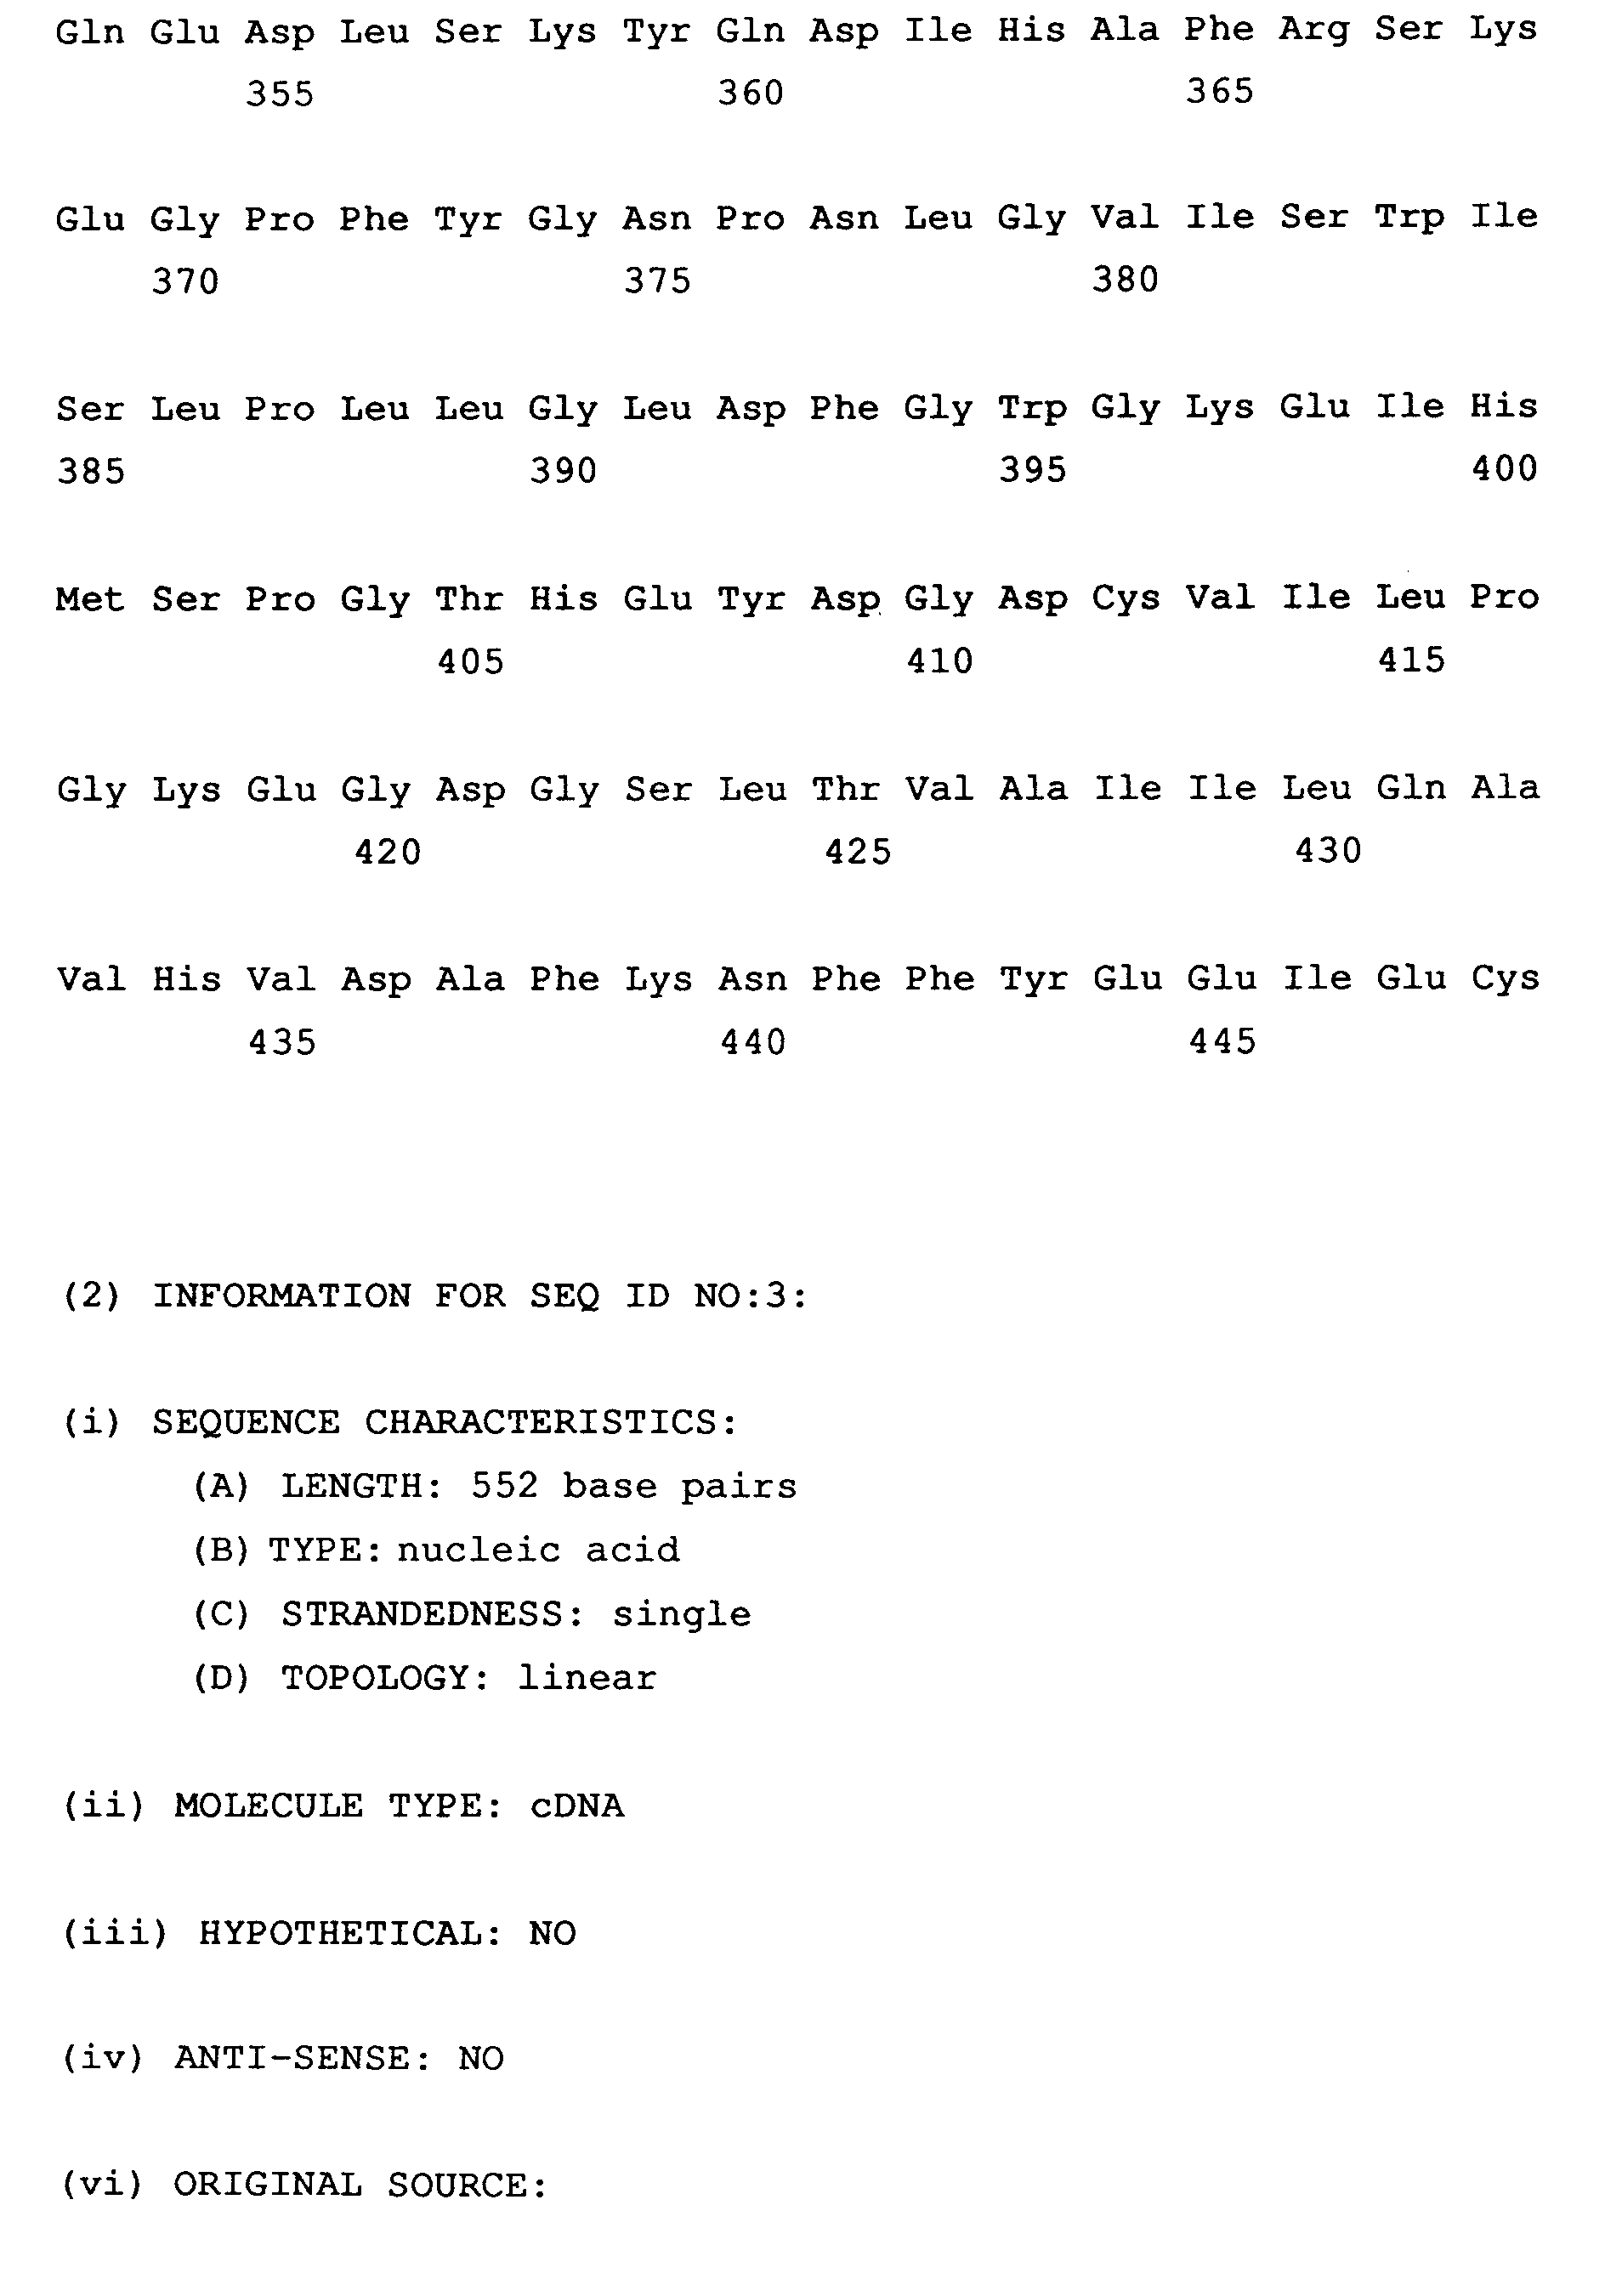 PCT-MA2-m σεξ που χρονολογείται πρώην εθισμένος στην κοκαΐνη